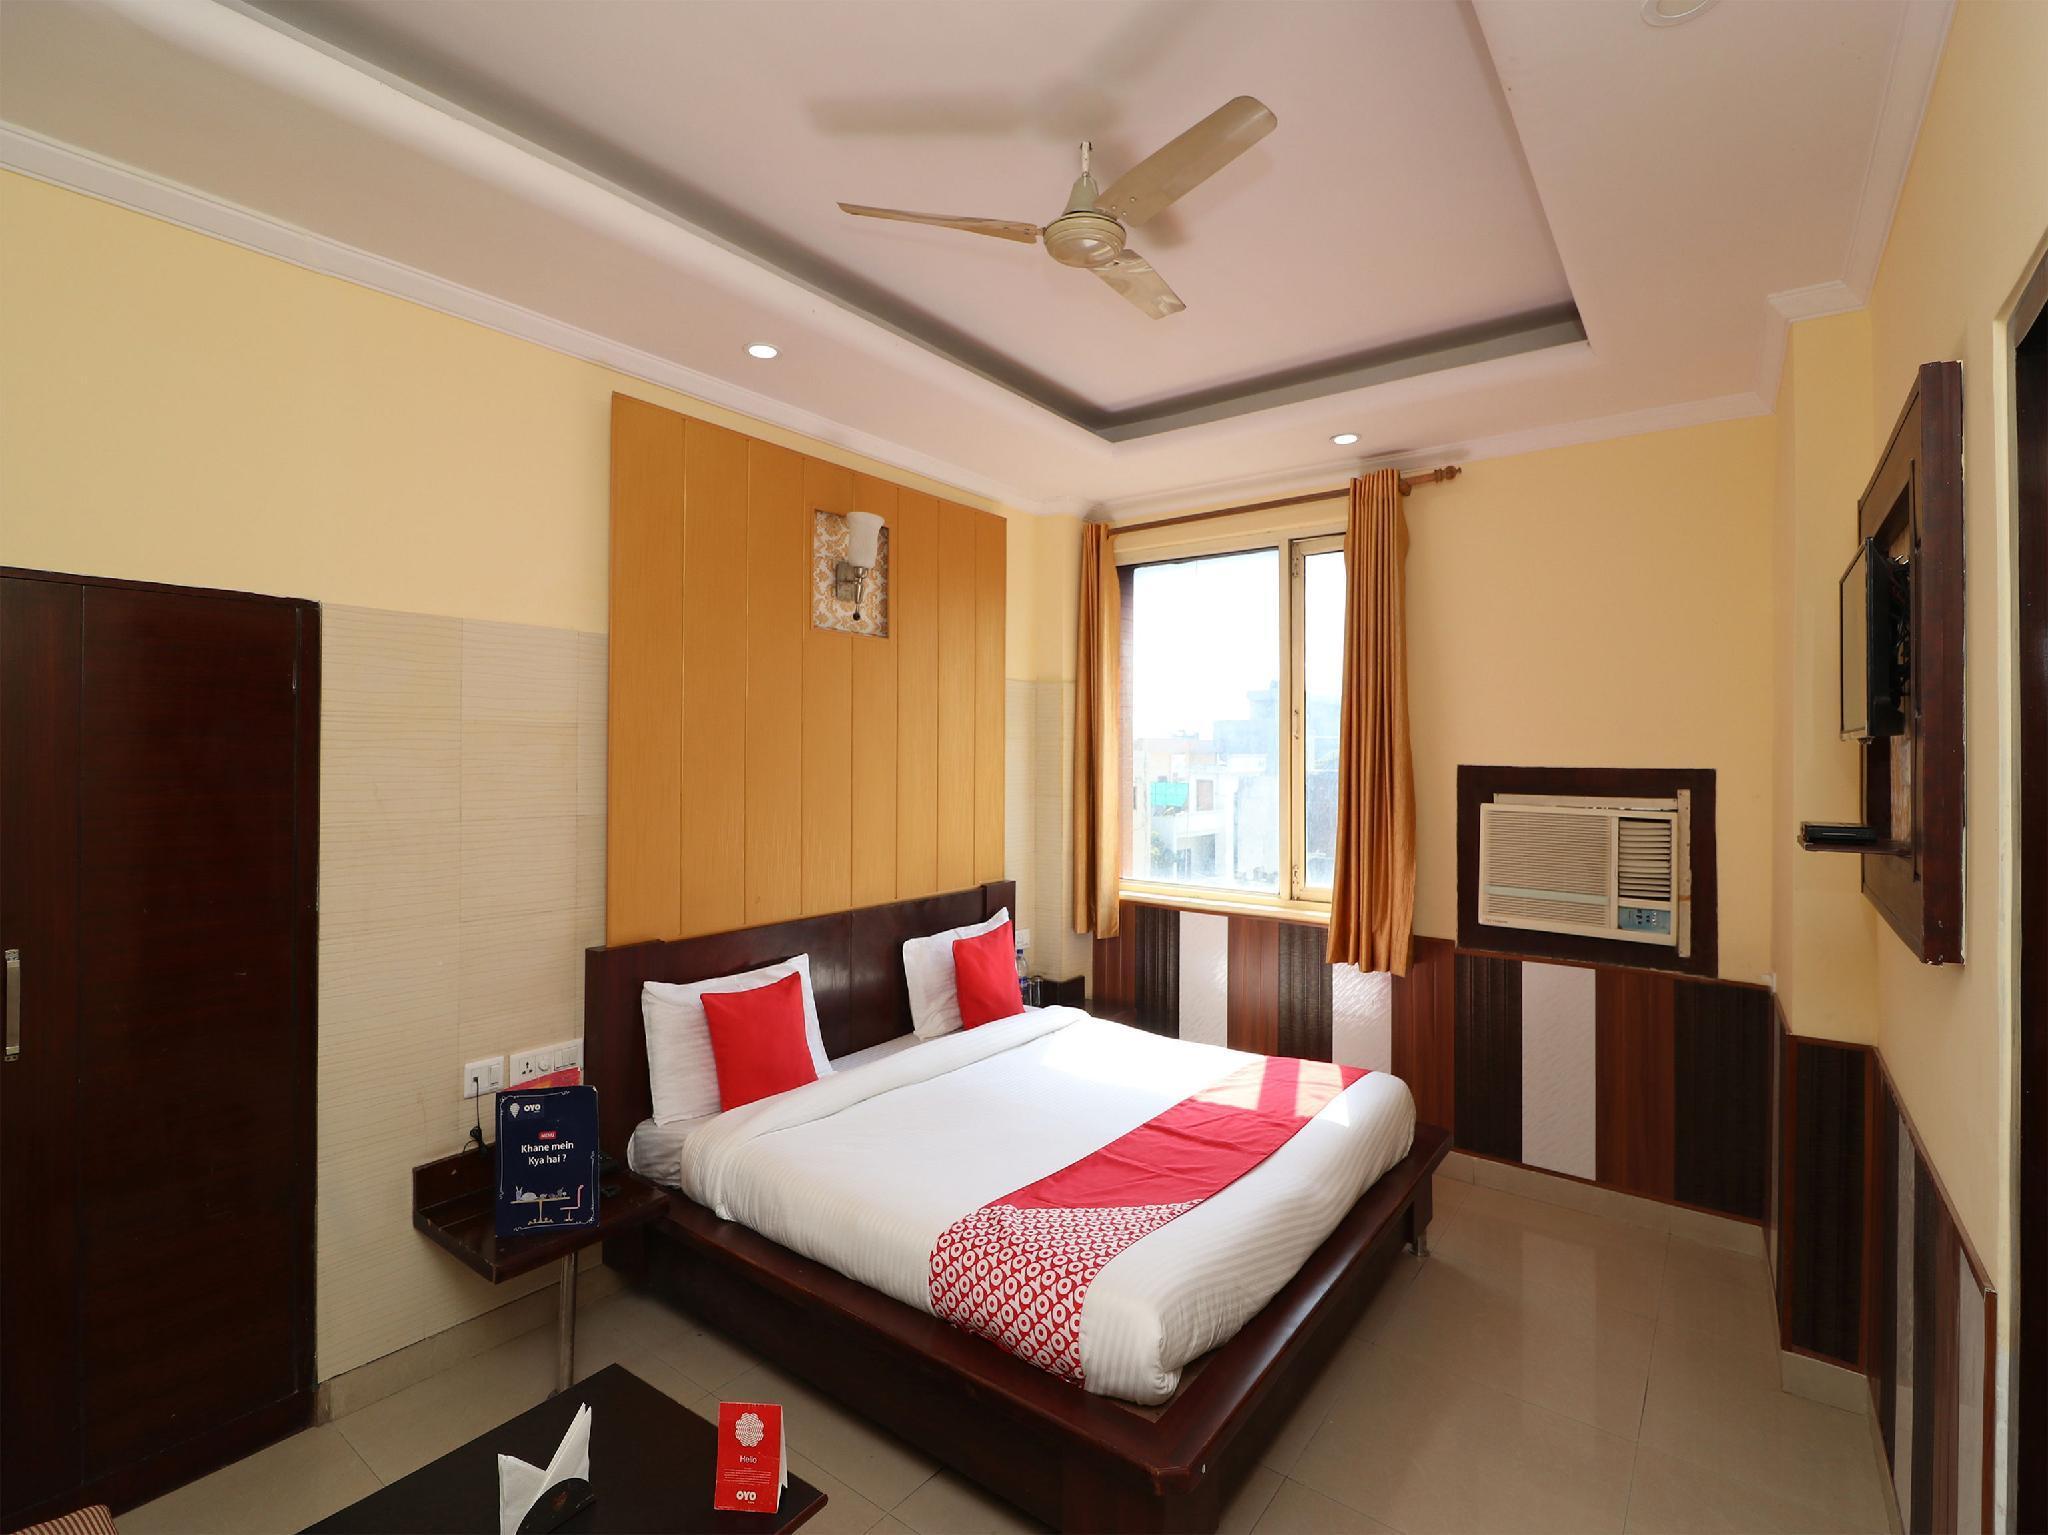 OYO 3735 Hotel Chilana Tower